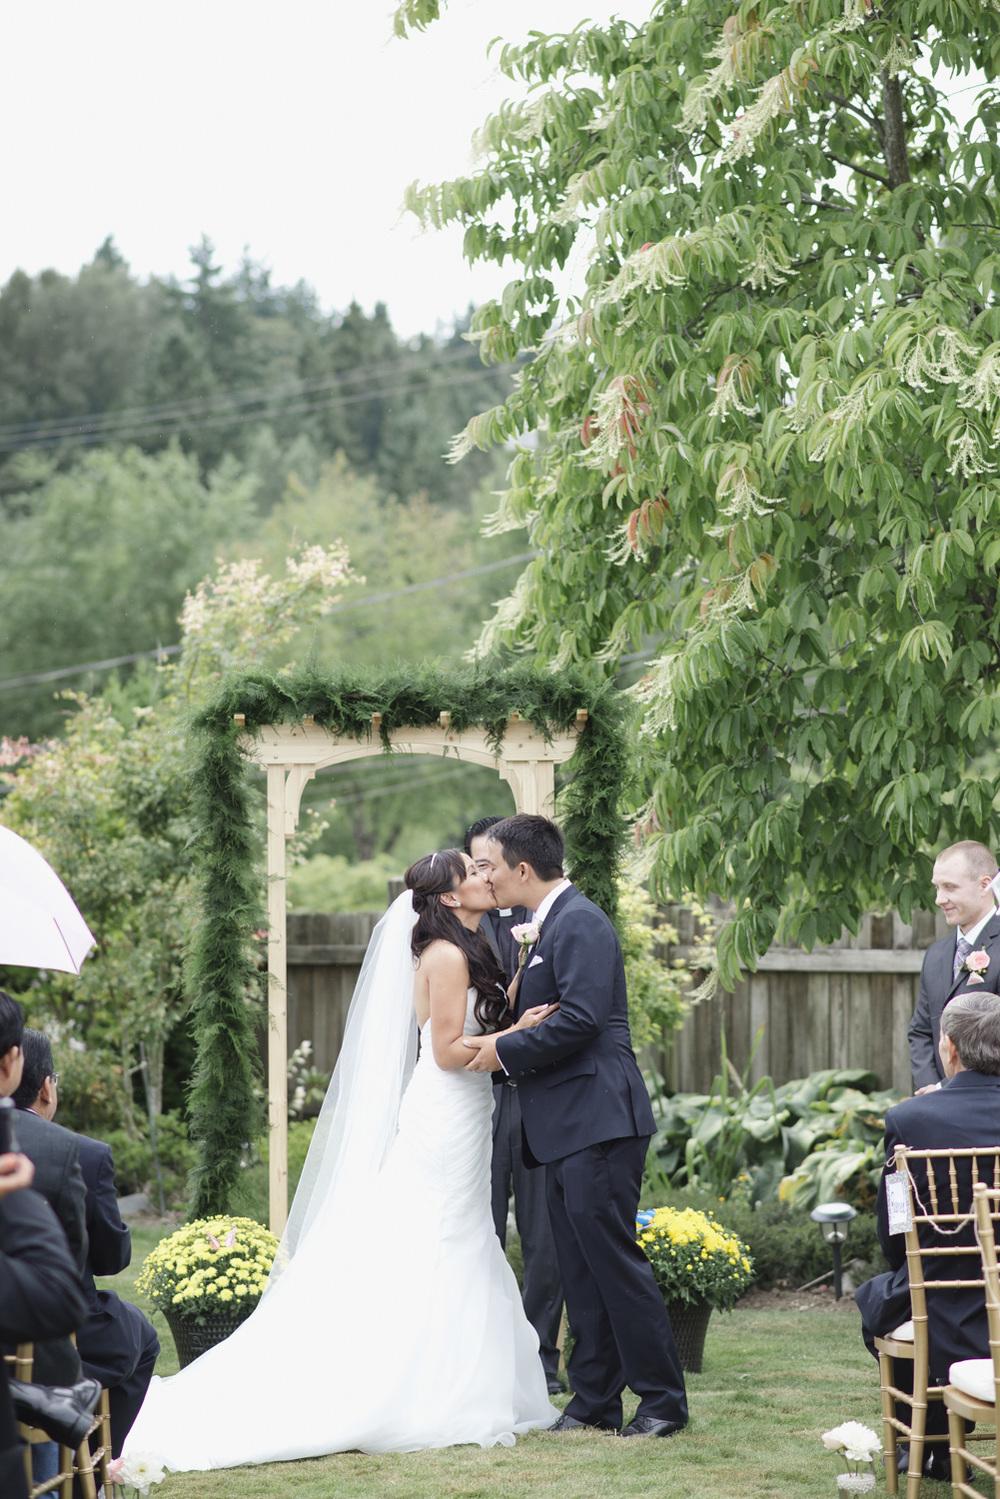 Kelly & Justin_Deer Lake Park Wedding_Vancouver Wedding Photography-Katie Powell Photography_32.jpg